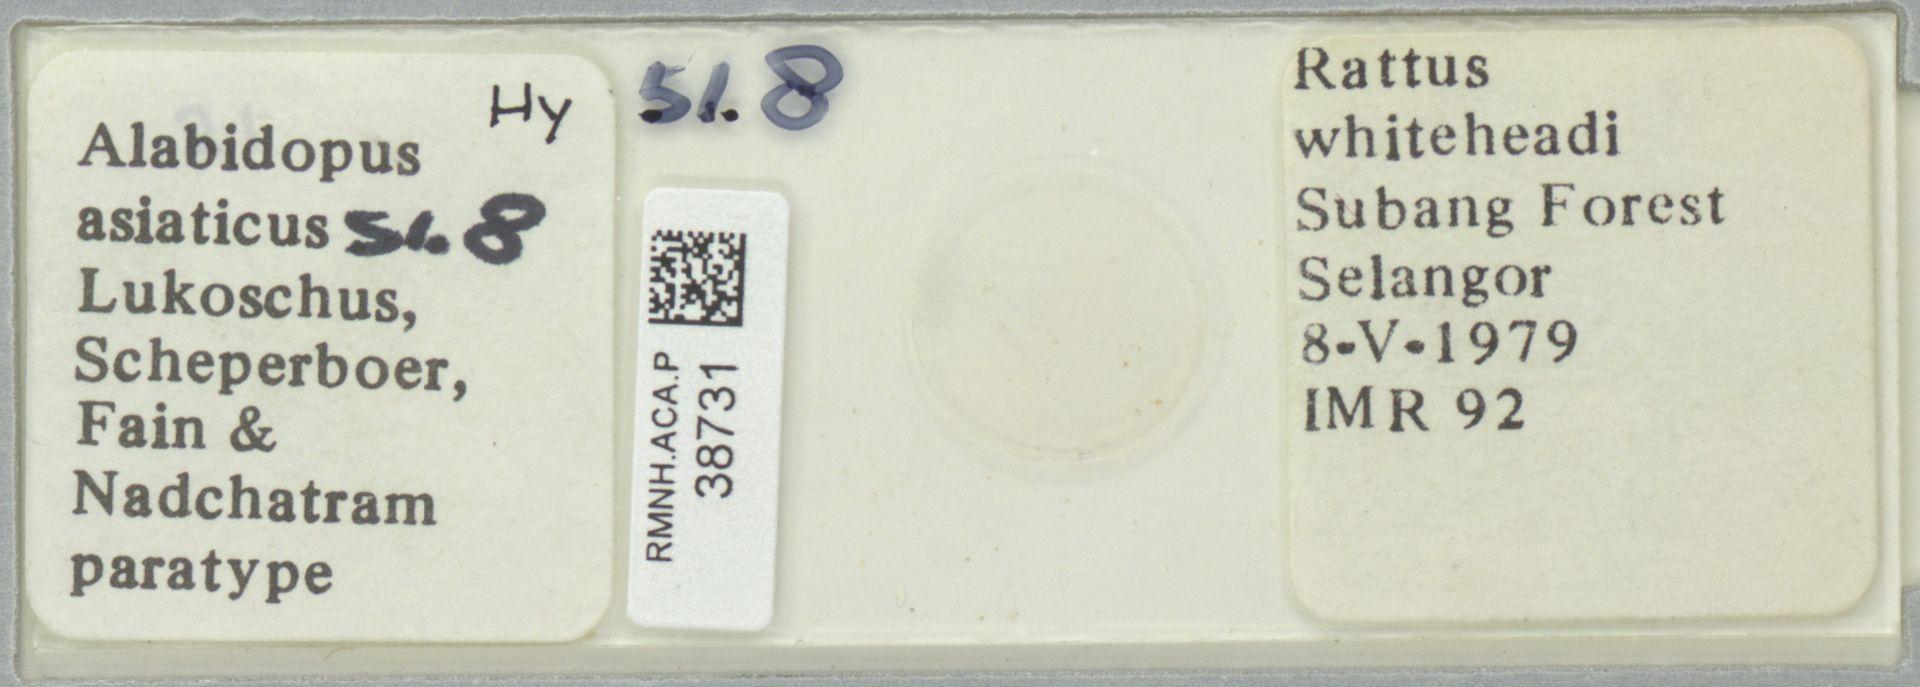 RMNH.ACA.P.38731 | Alabidopus asiaticus Lukoschus, Scheperboer, Fain & Nadchatram